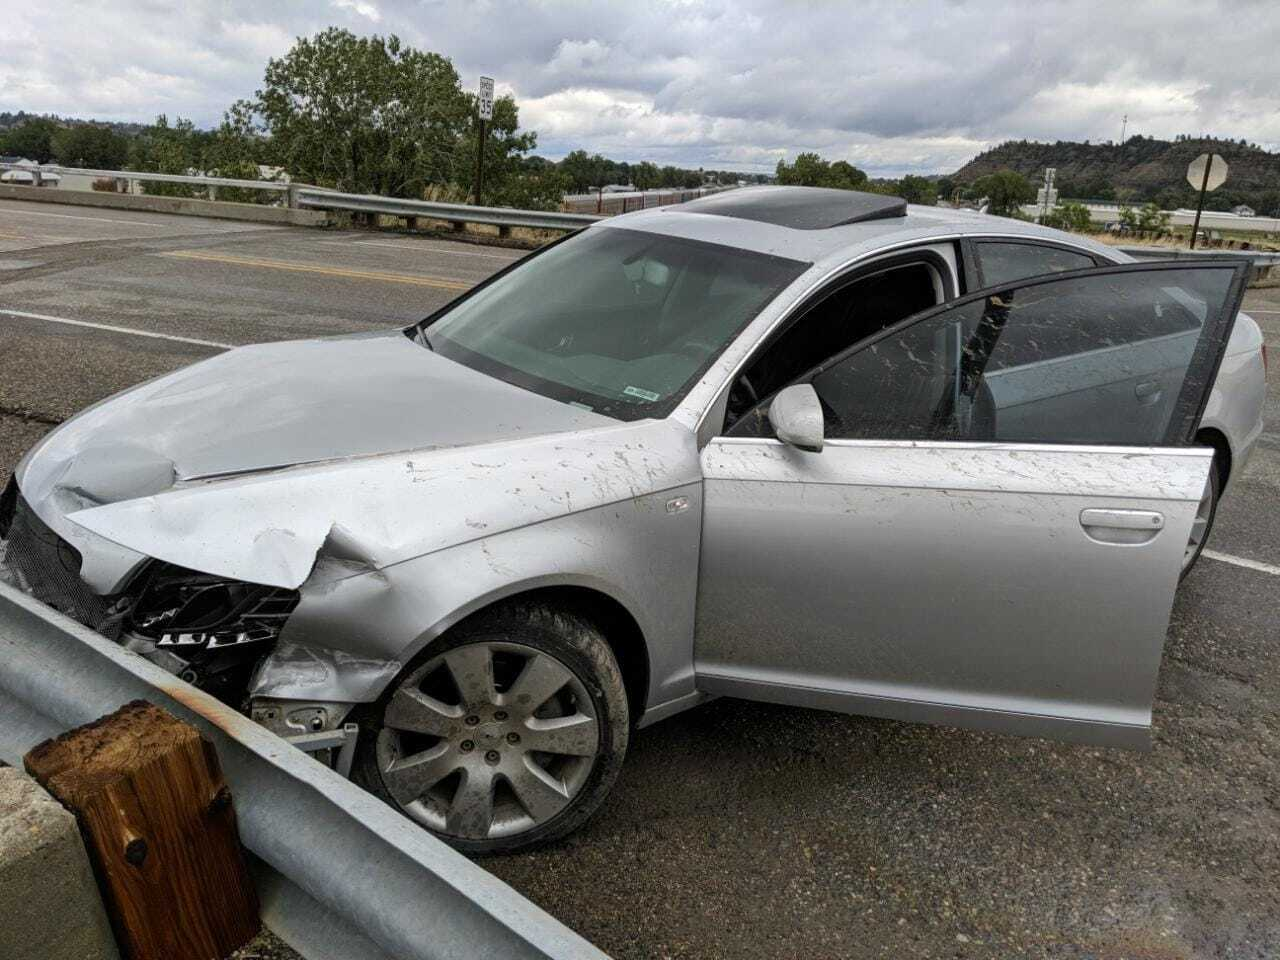 Crashed Audi Rosebud Co Sheriff's office.jpg